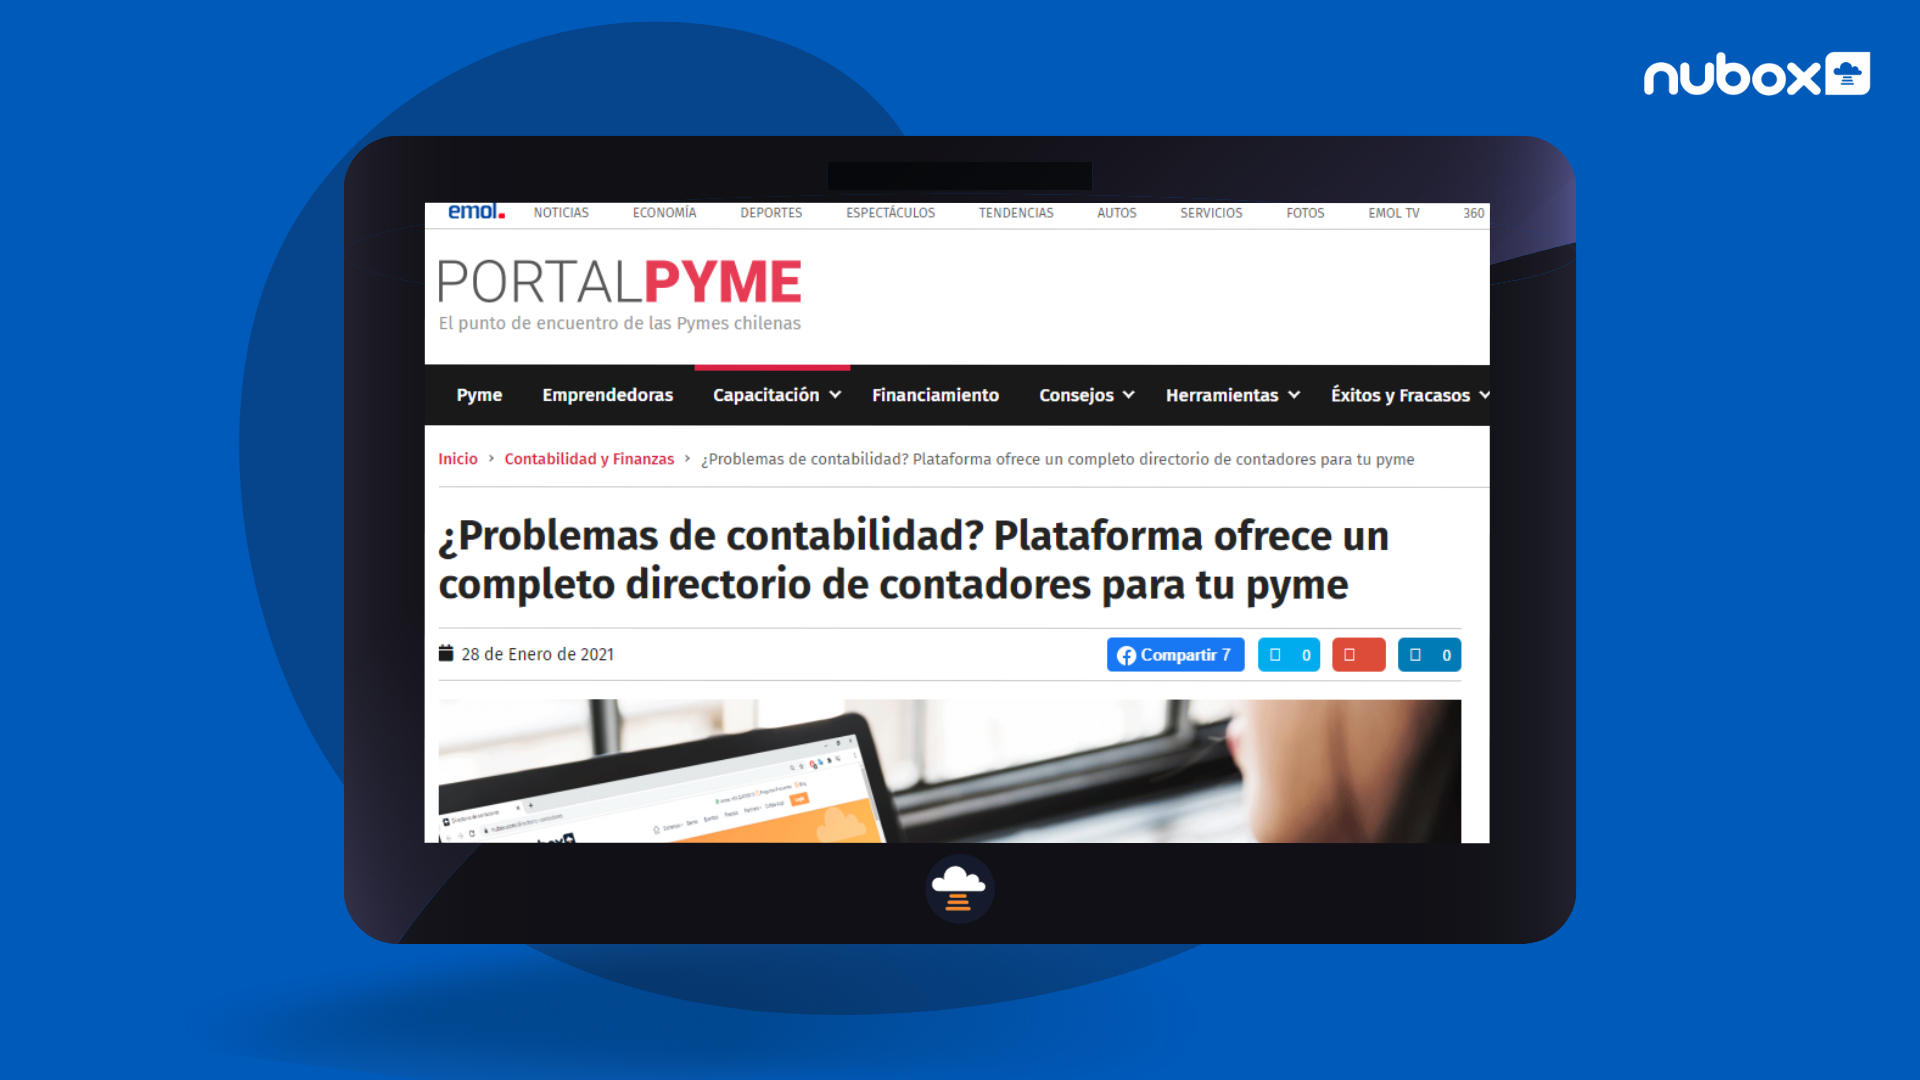 Portal Pyme destacó directorio de contadores